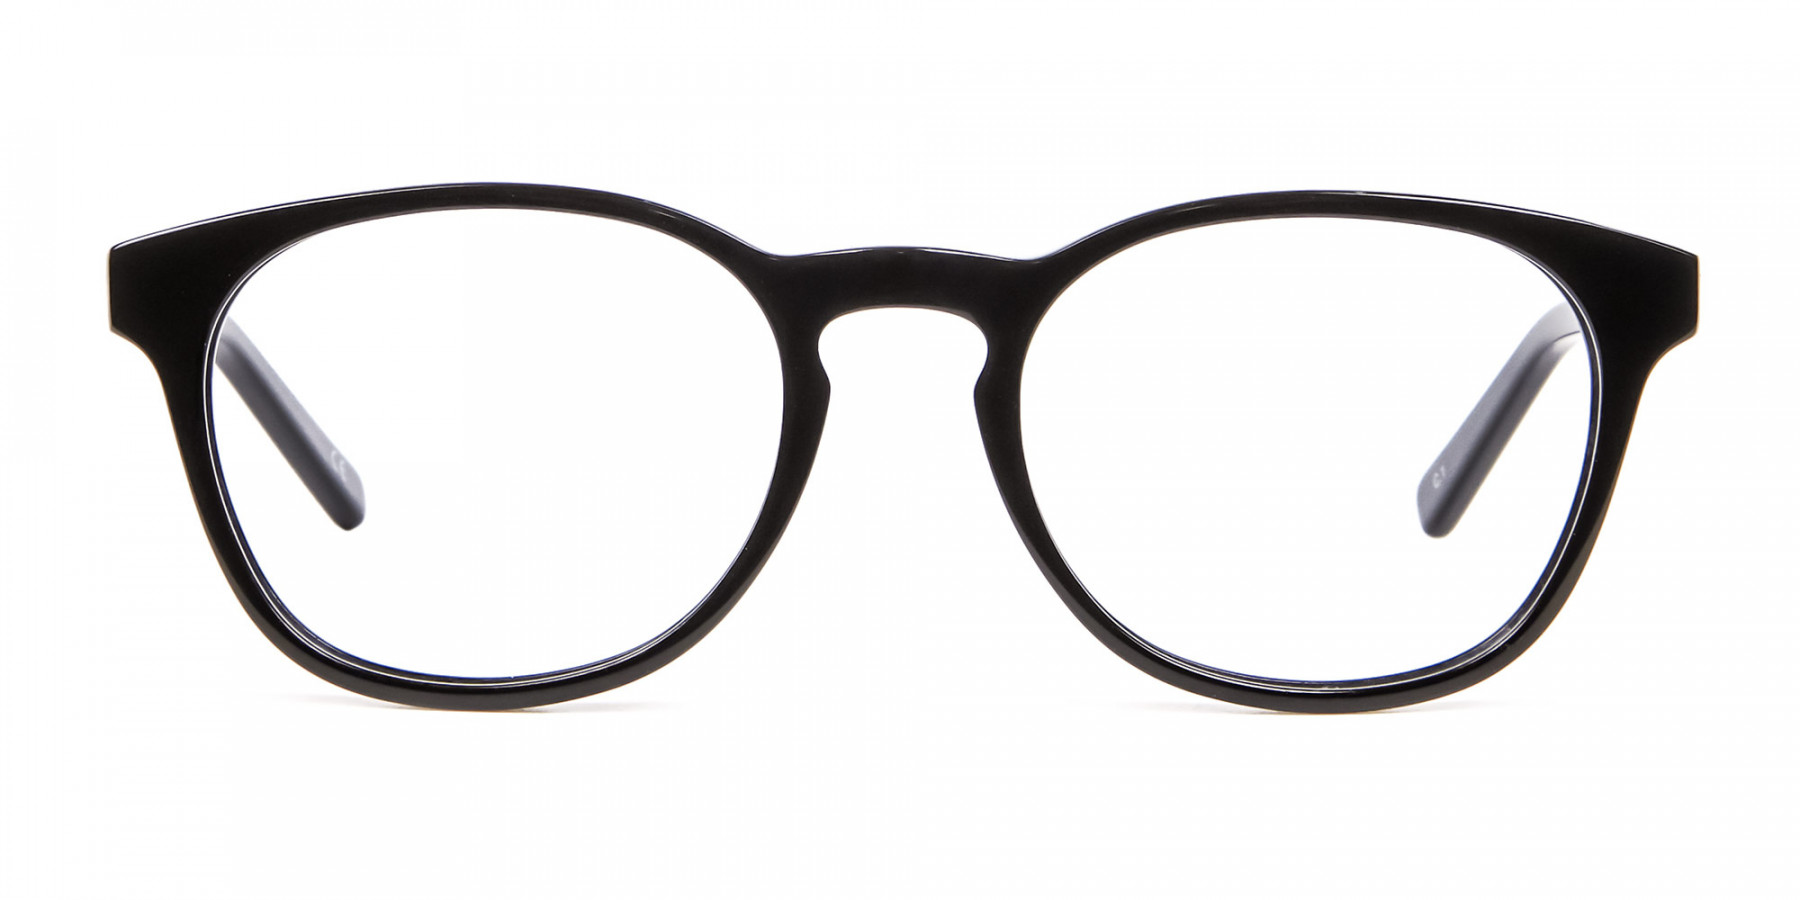 Round Shape Glasses in Black- 1